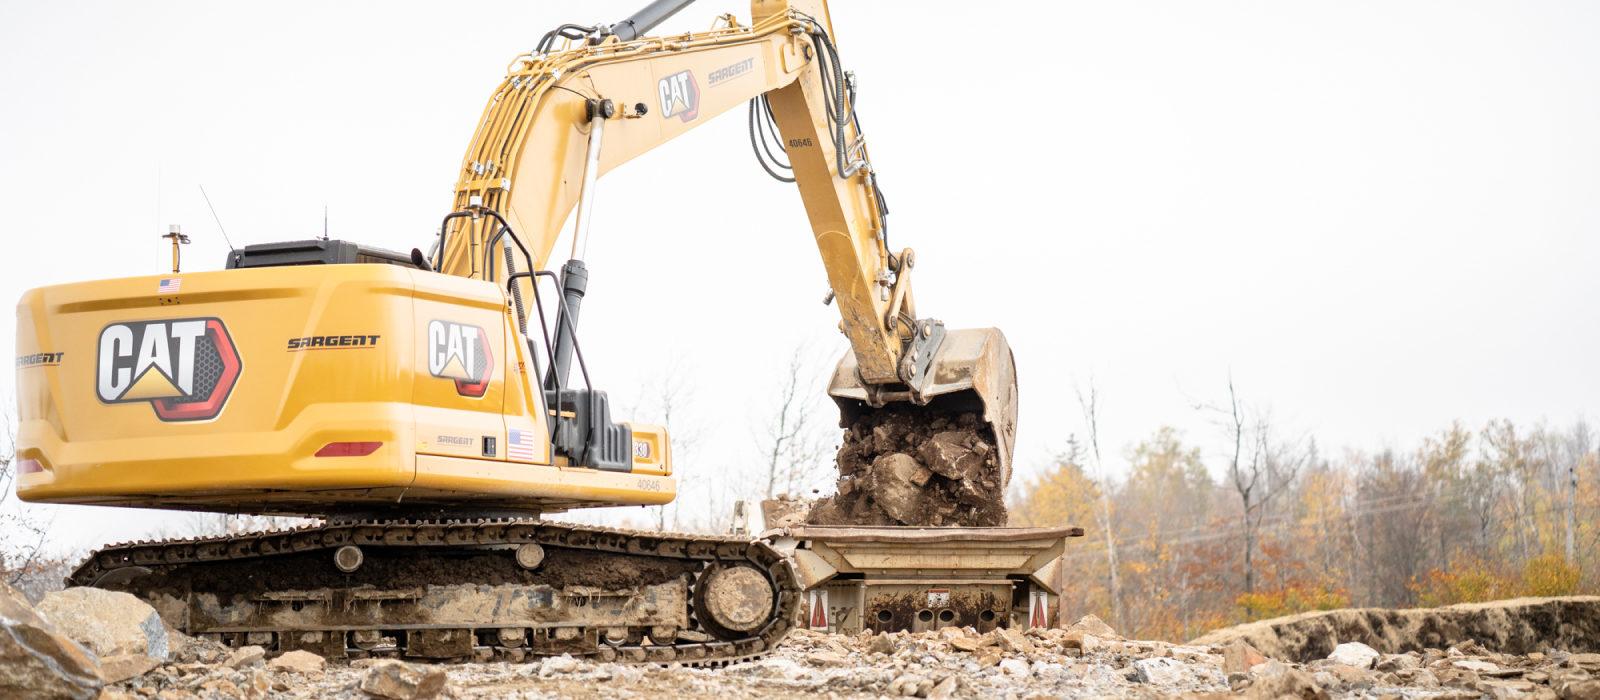 Lagre Excavator Lifting Large Rocks